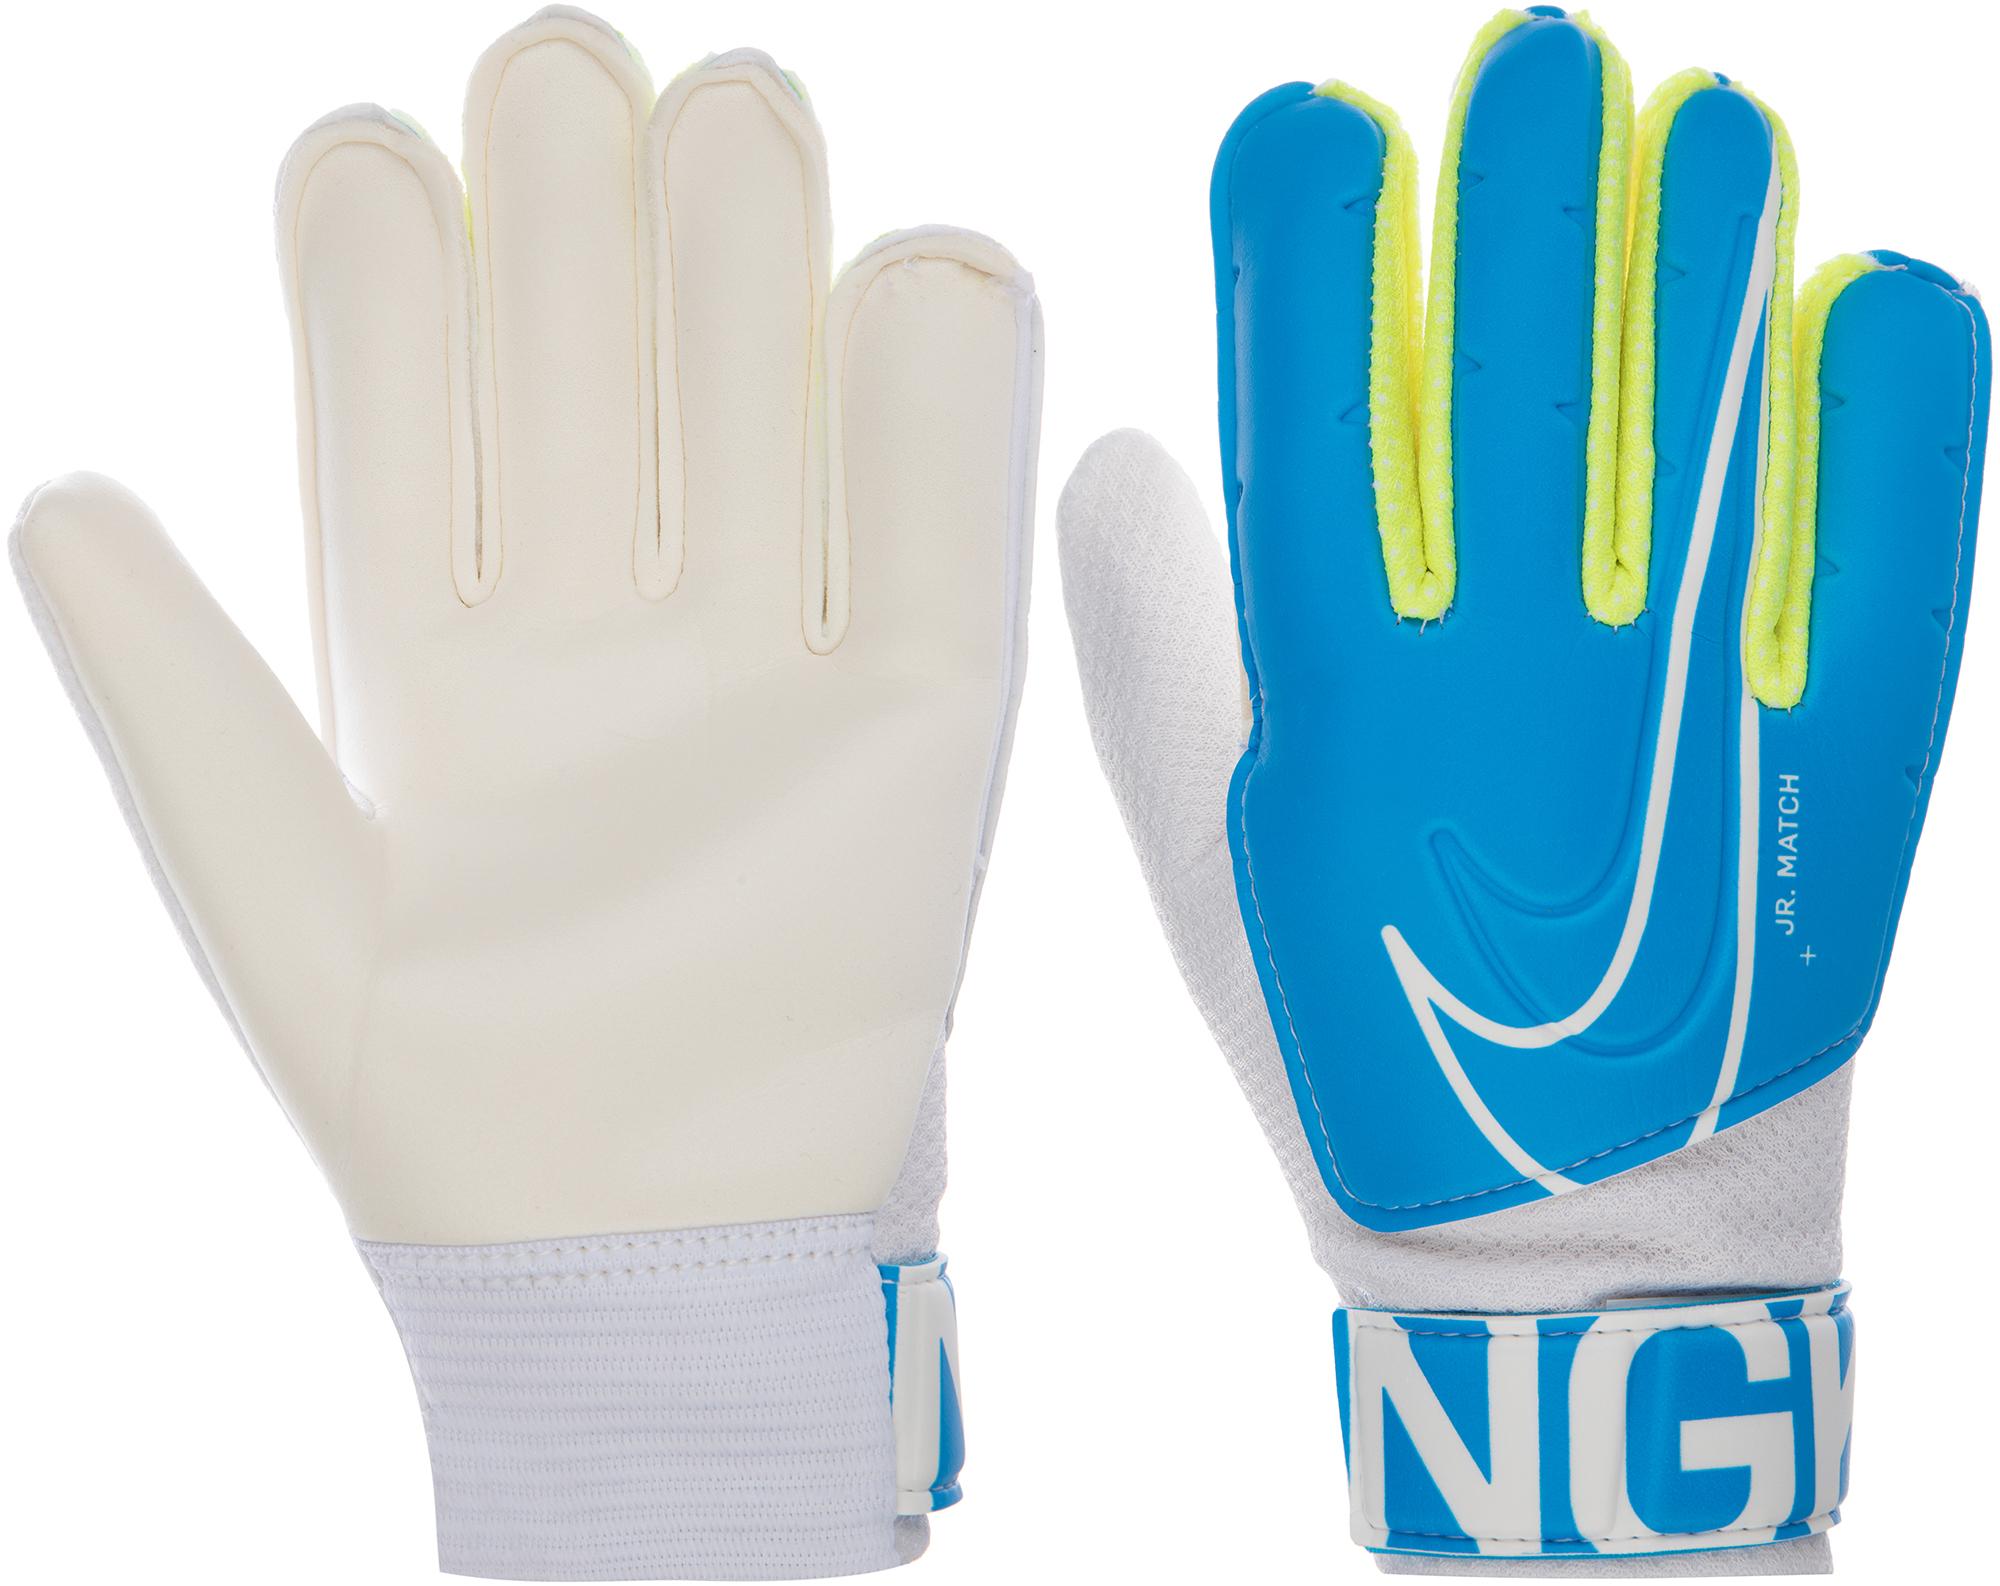 Nike Перчатки вратарские детские Nike, размер 7 nike перчатки мужские nike размер l